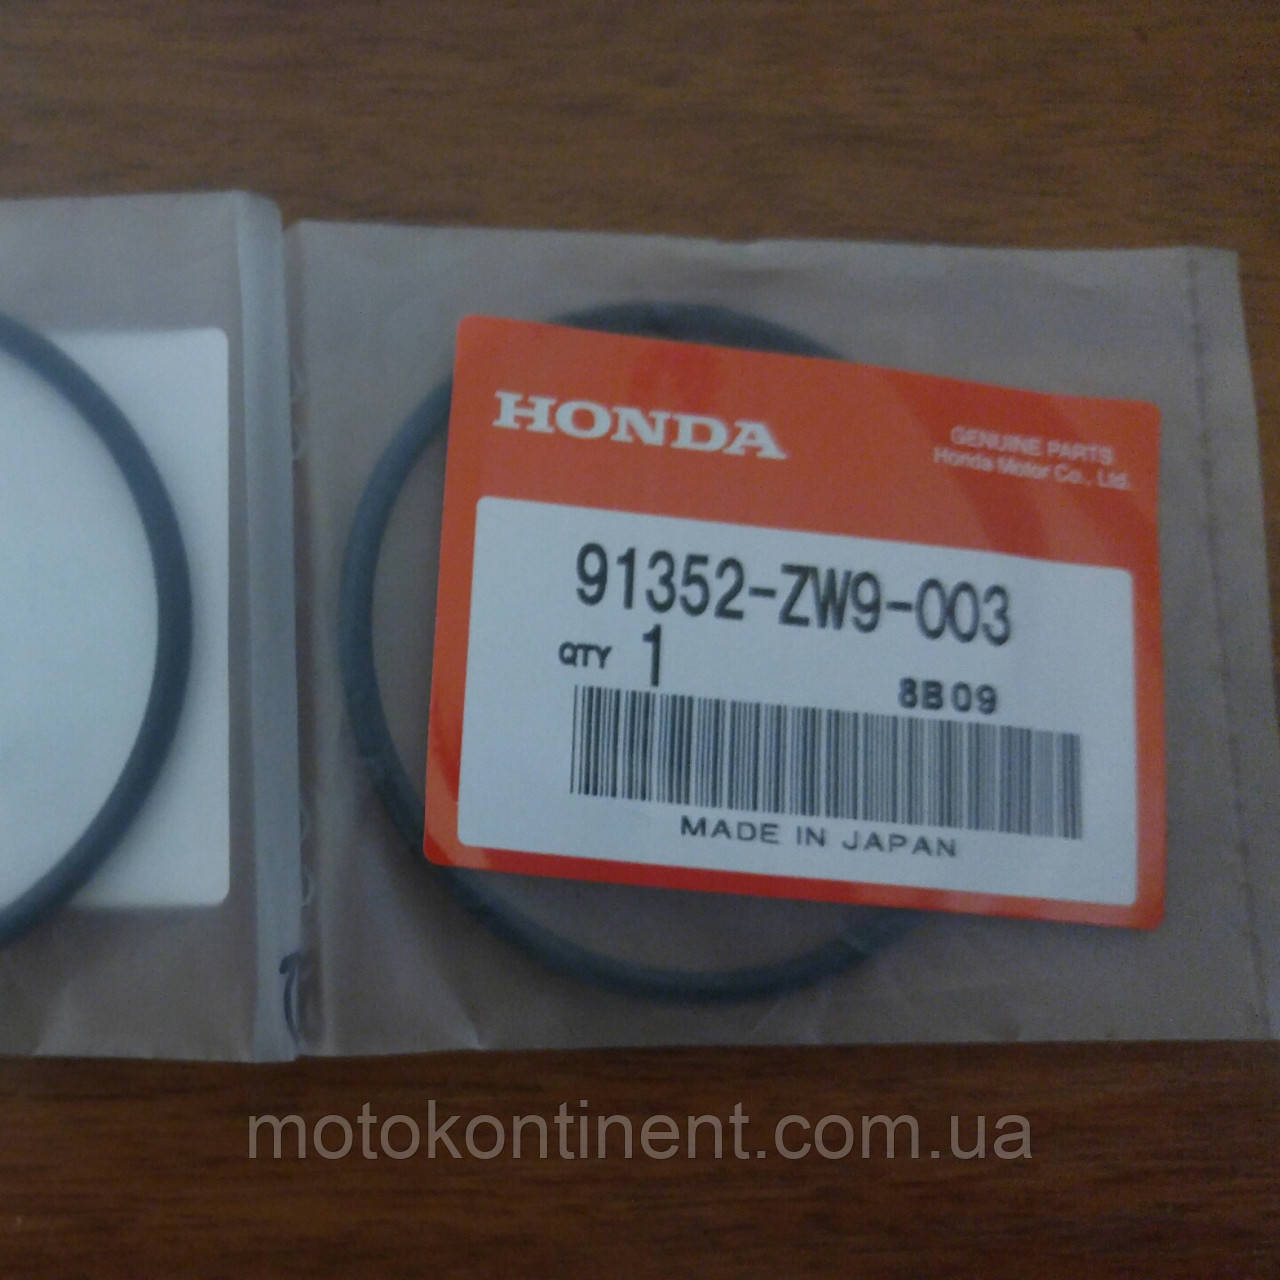 91352-ZW9-003 Кольцо уплотнительное  Honda BF8/BF9.9/BF15/BF20